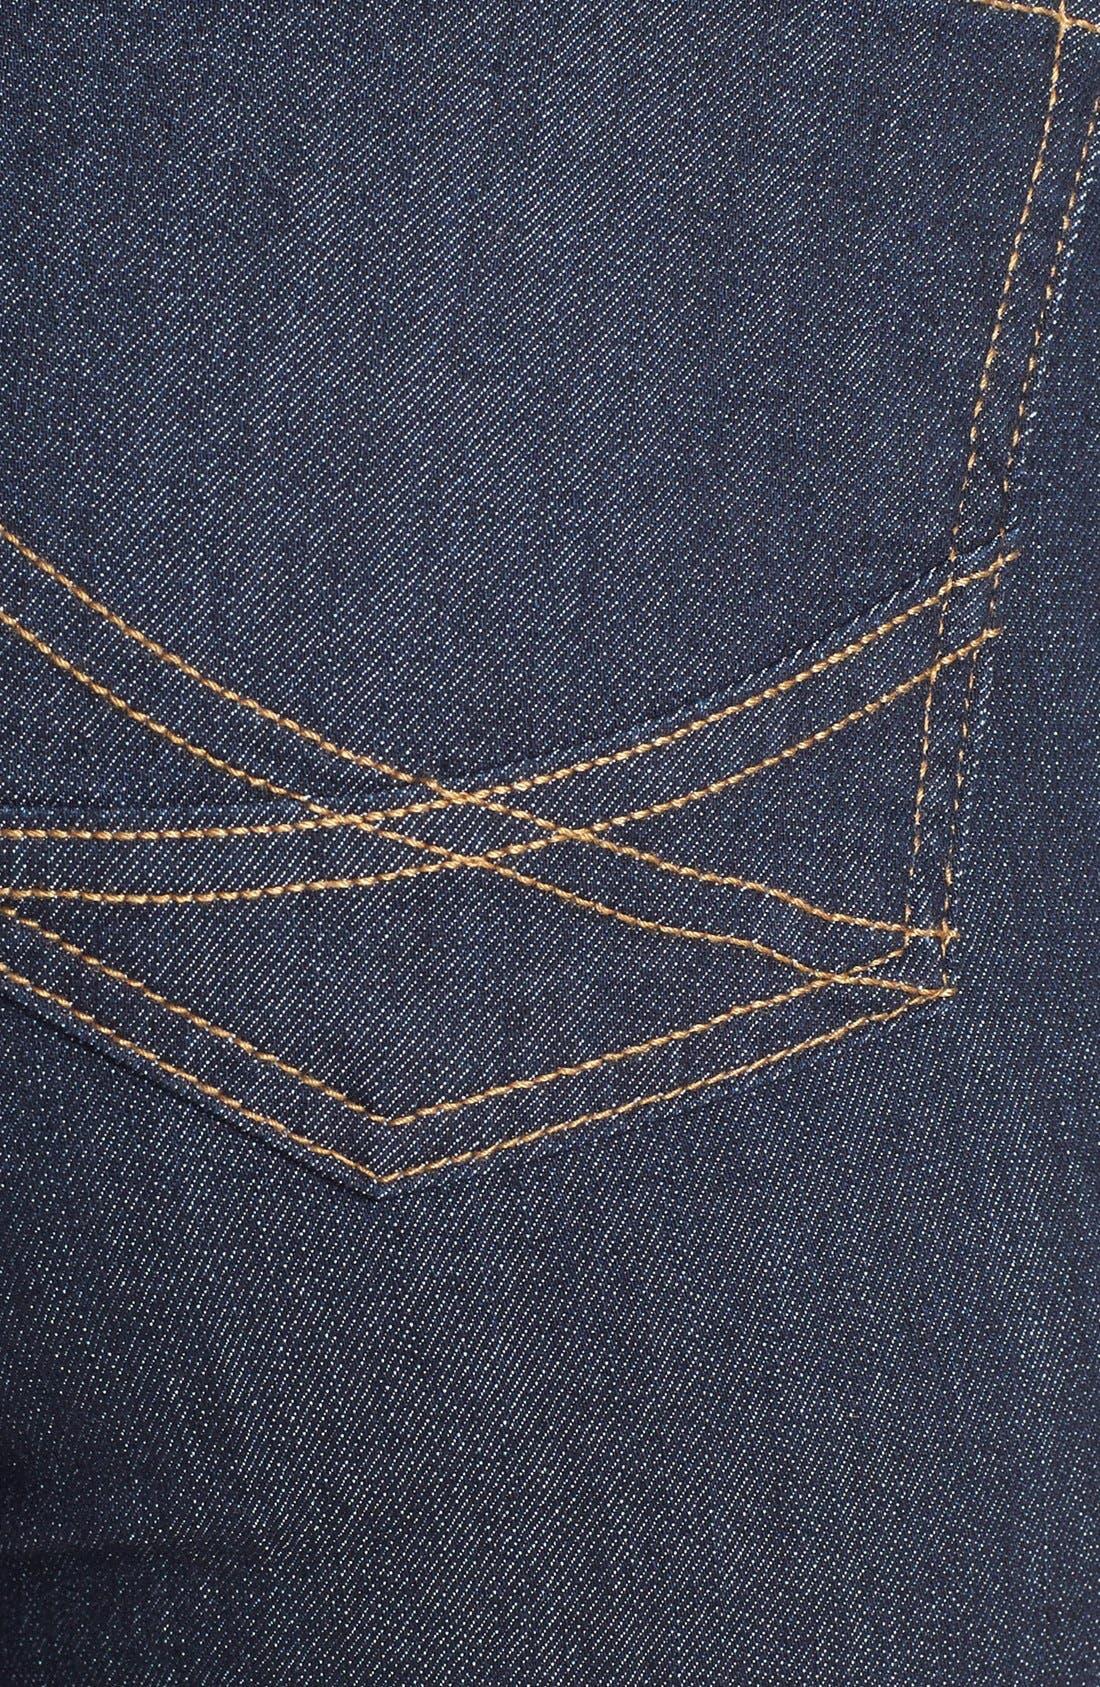 Alternate Image 3  - NYDJ 'Marilyn' Stretch Straight Leg Jeans (Dark Enzyme) (Regular & Petite)